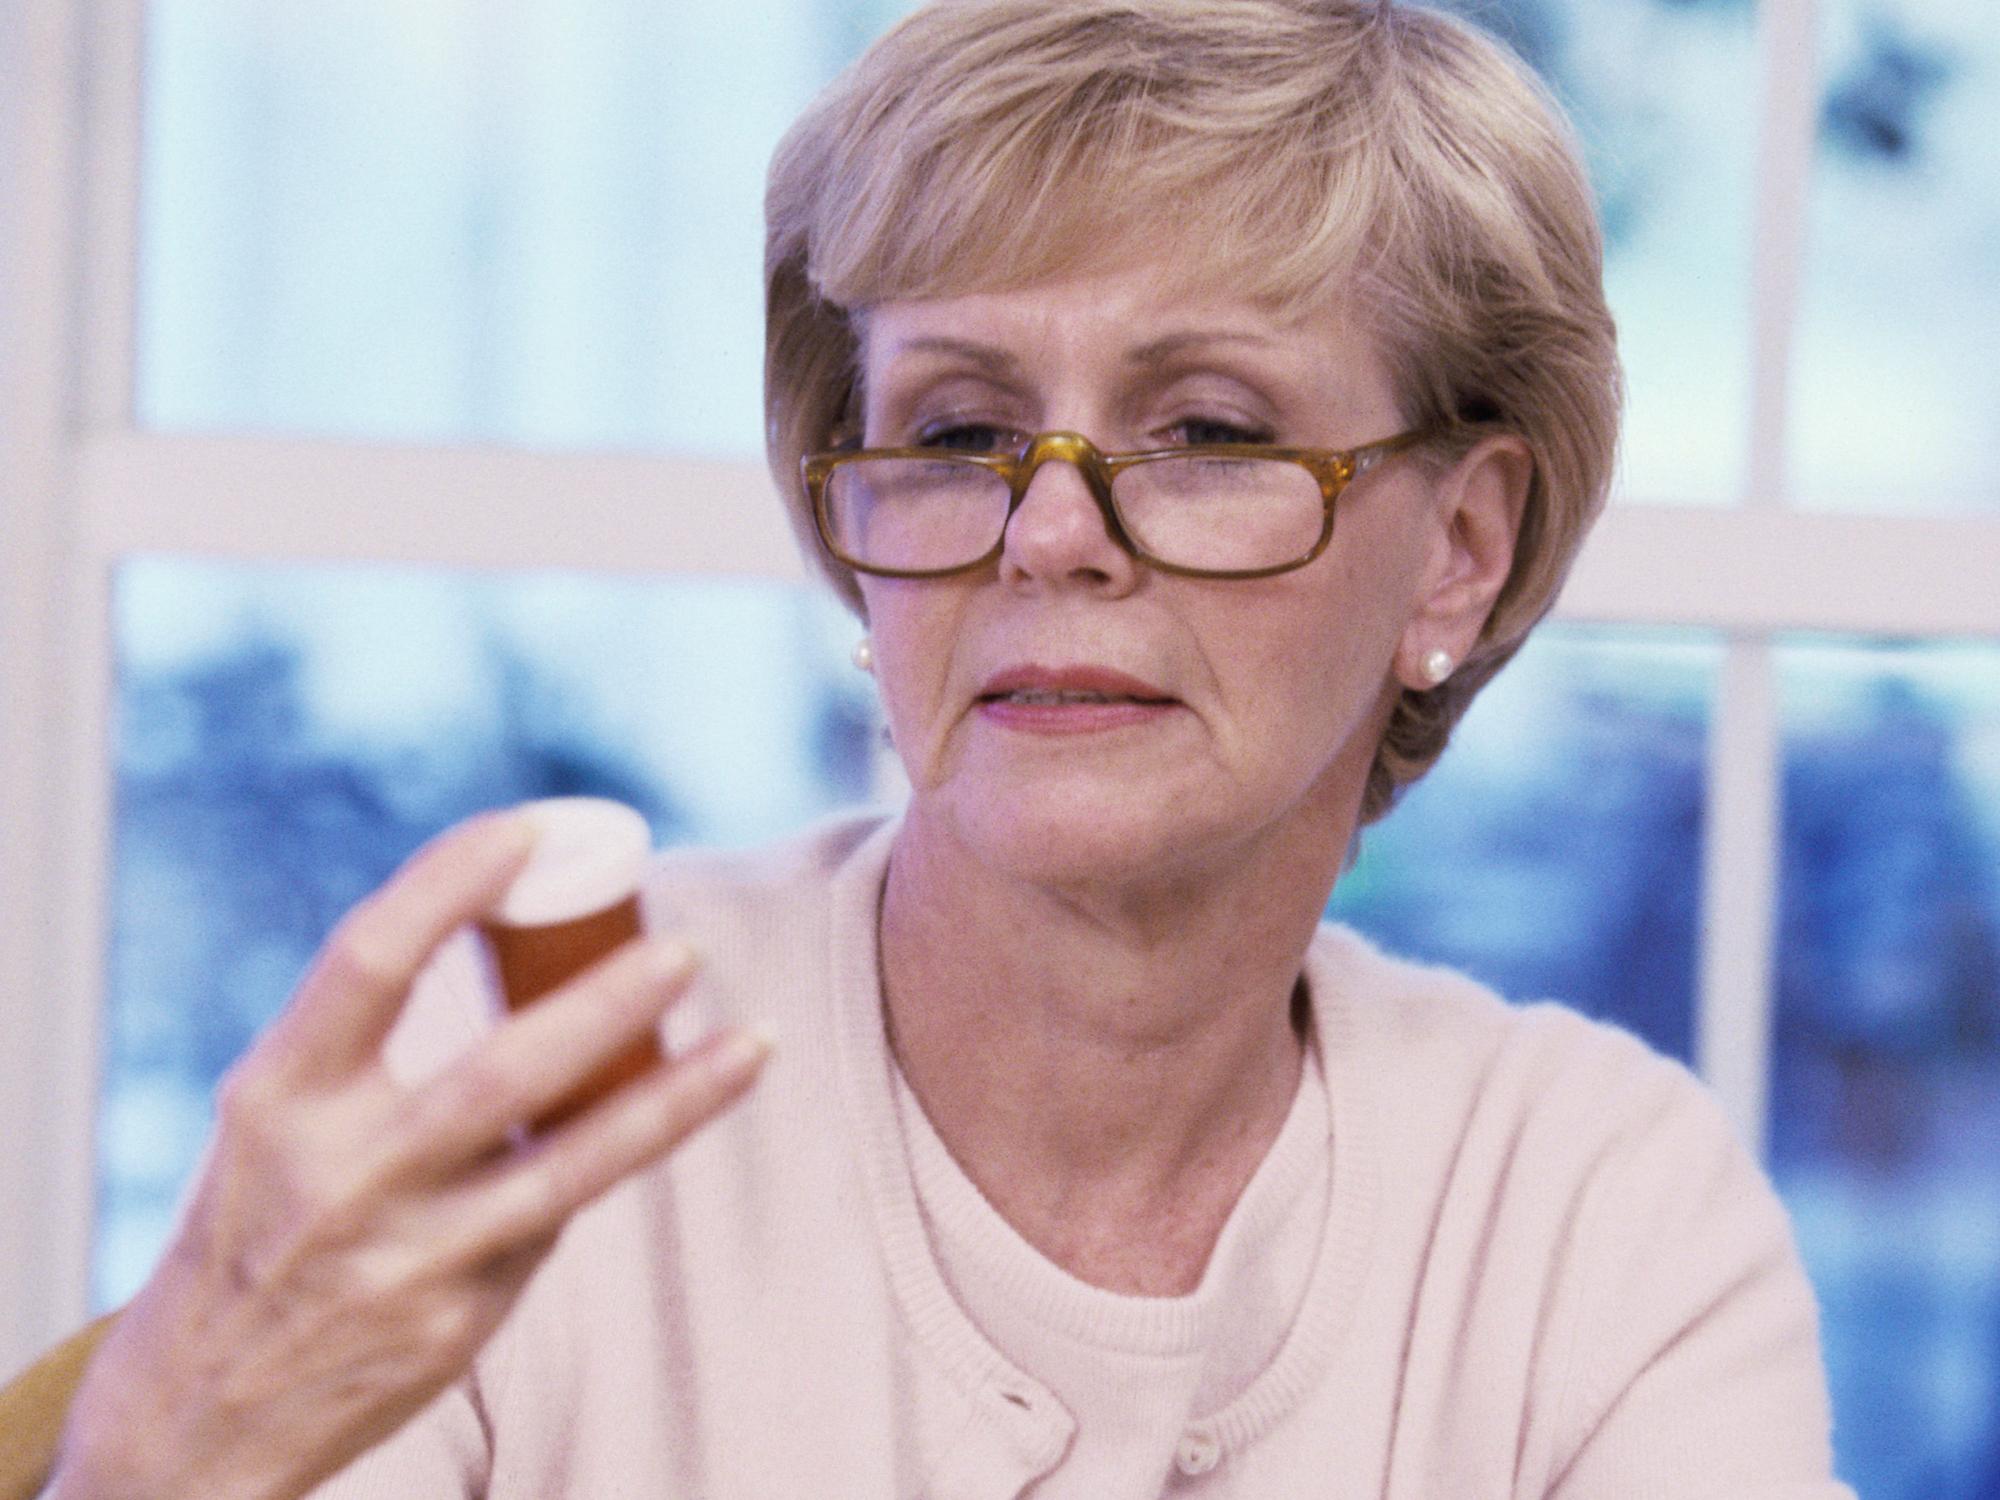 Cholesterol drugs: Prescription for disease